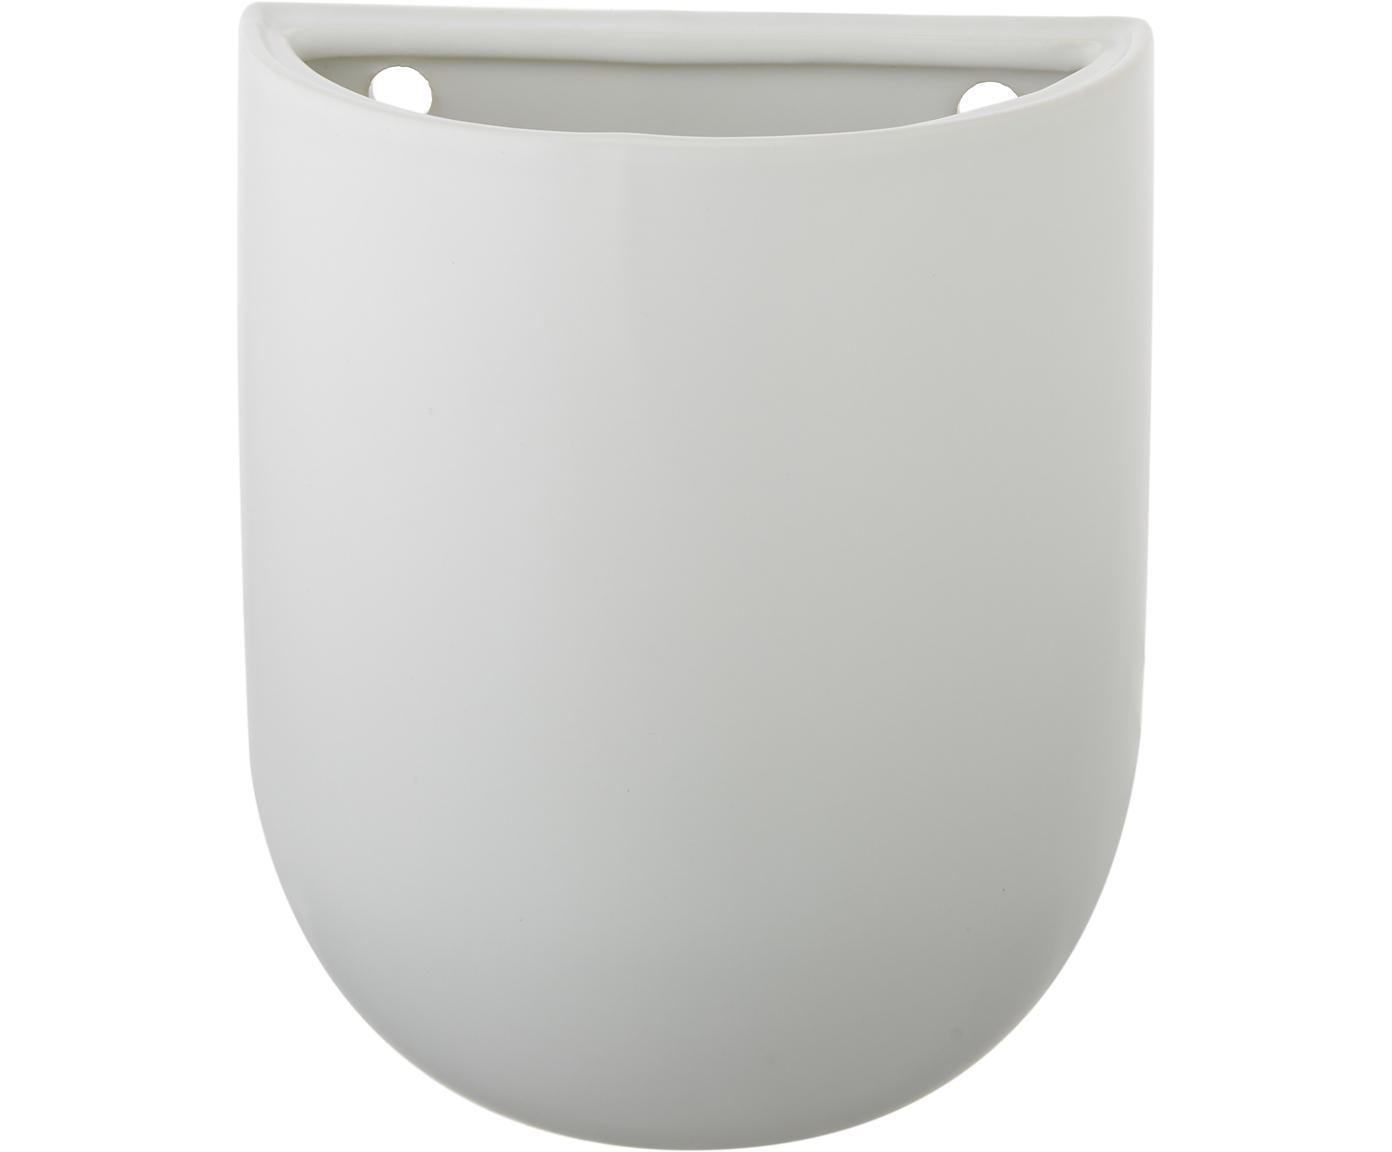 Wand-Übertopf Oval, Keramik, Weiß, 15 x 19 cm